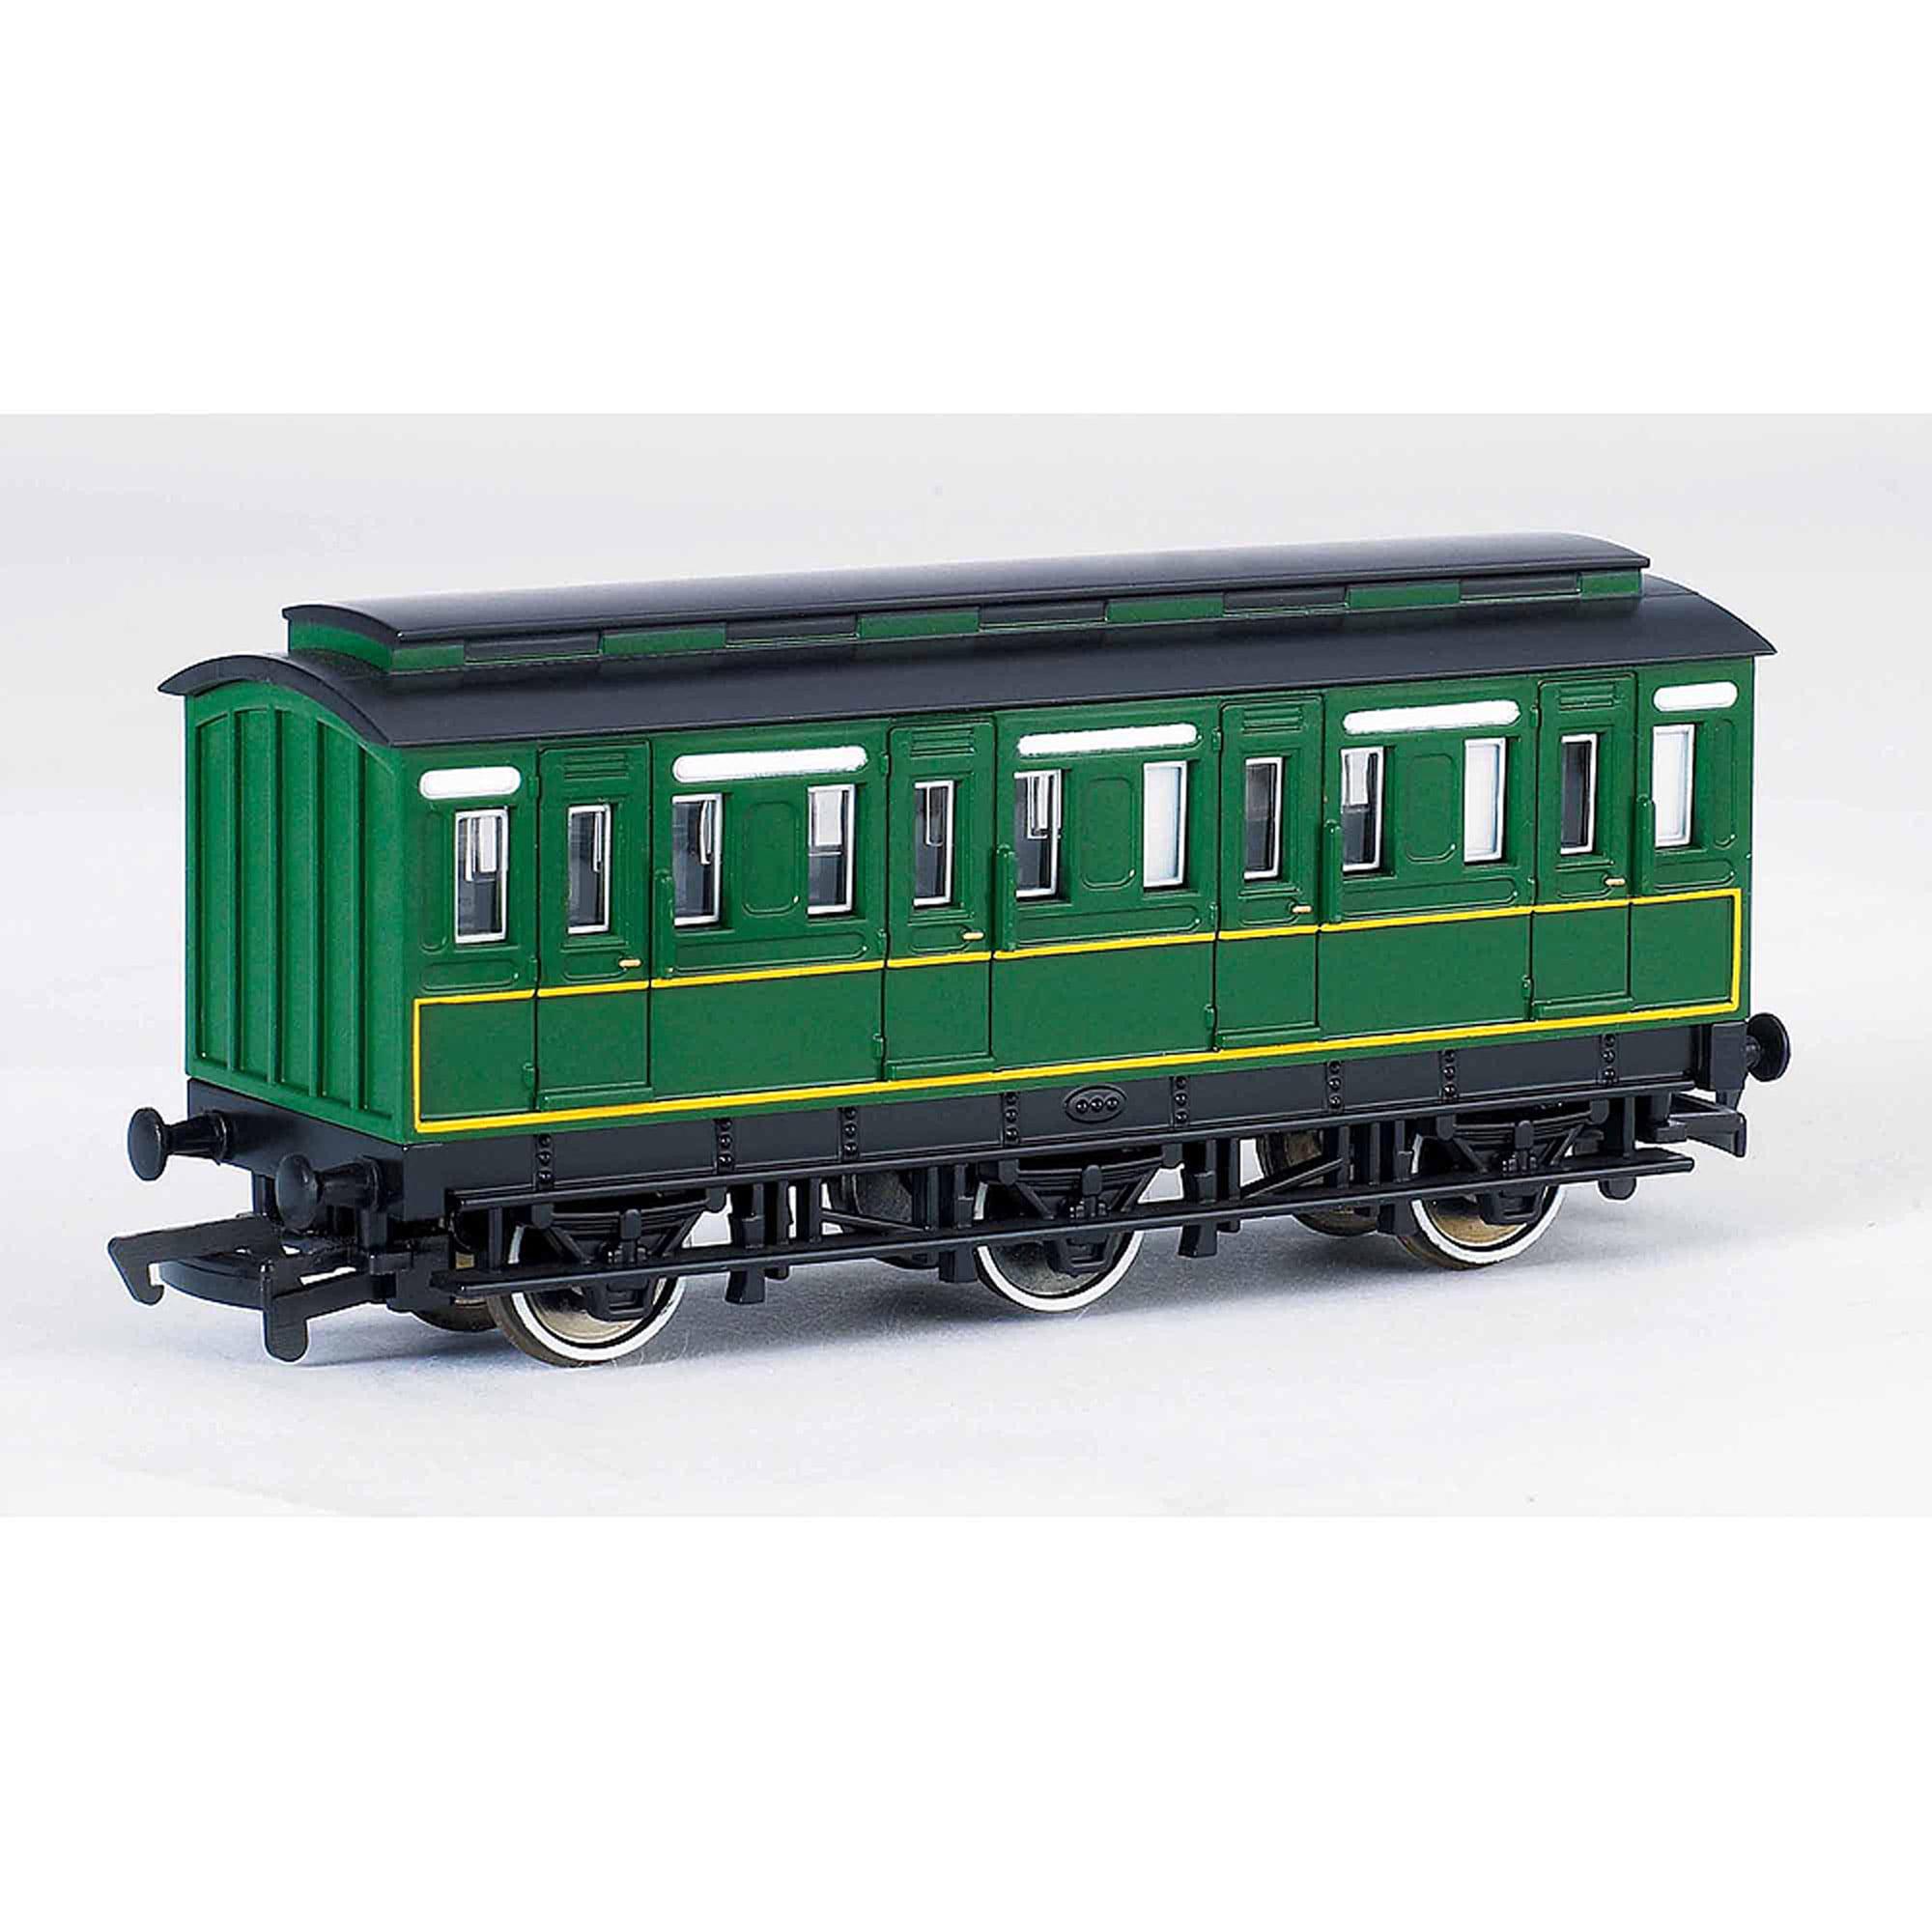 Bachmann Trains Thomas and Friends Emily's Brake Coach, HO Scale Train by Bachmann